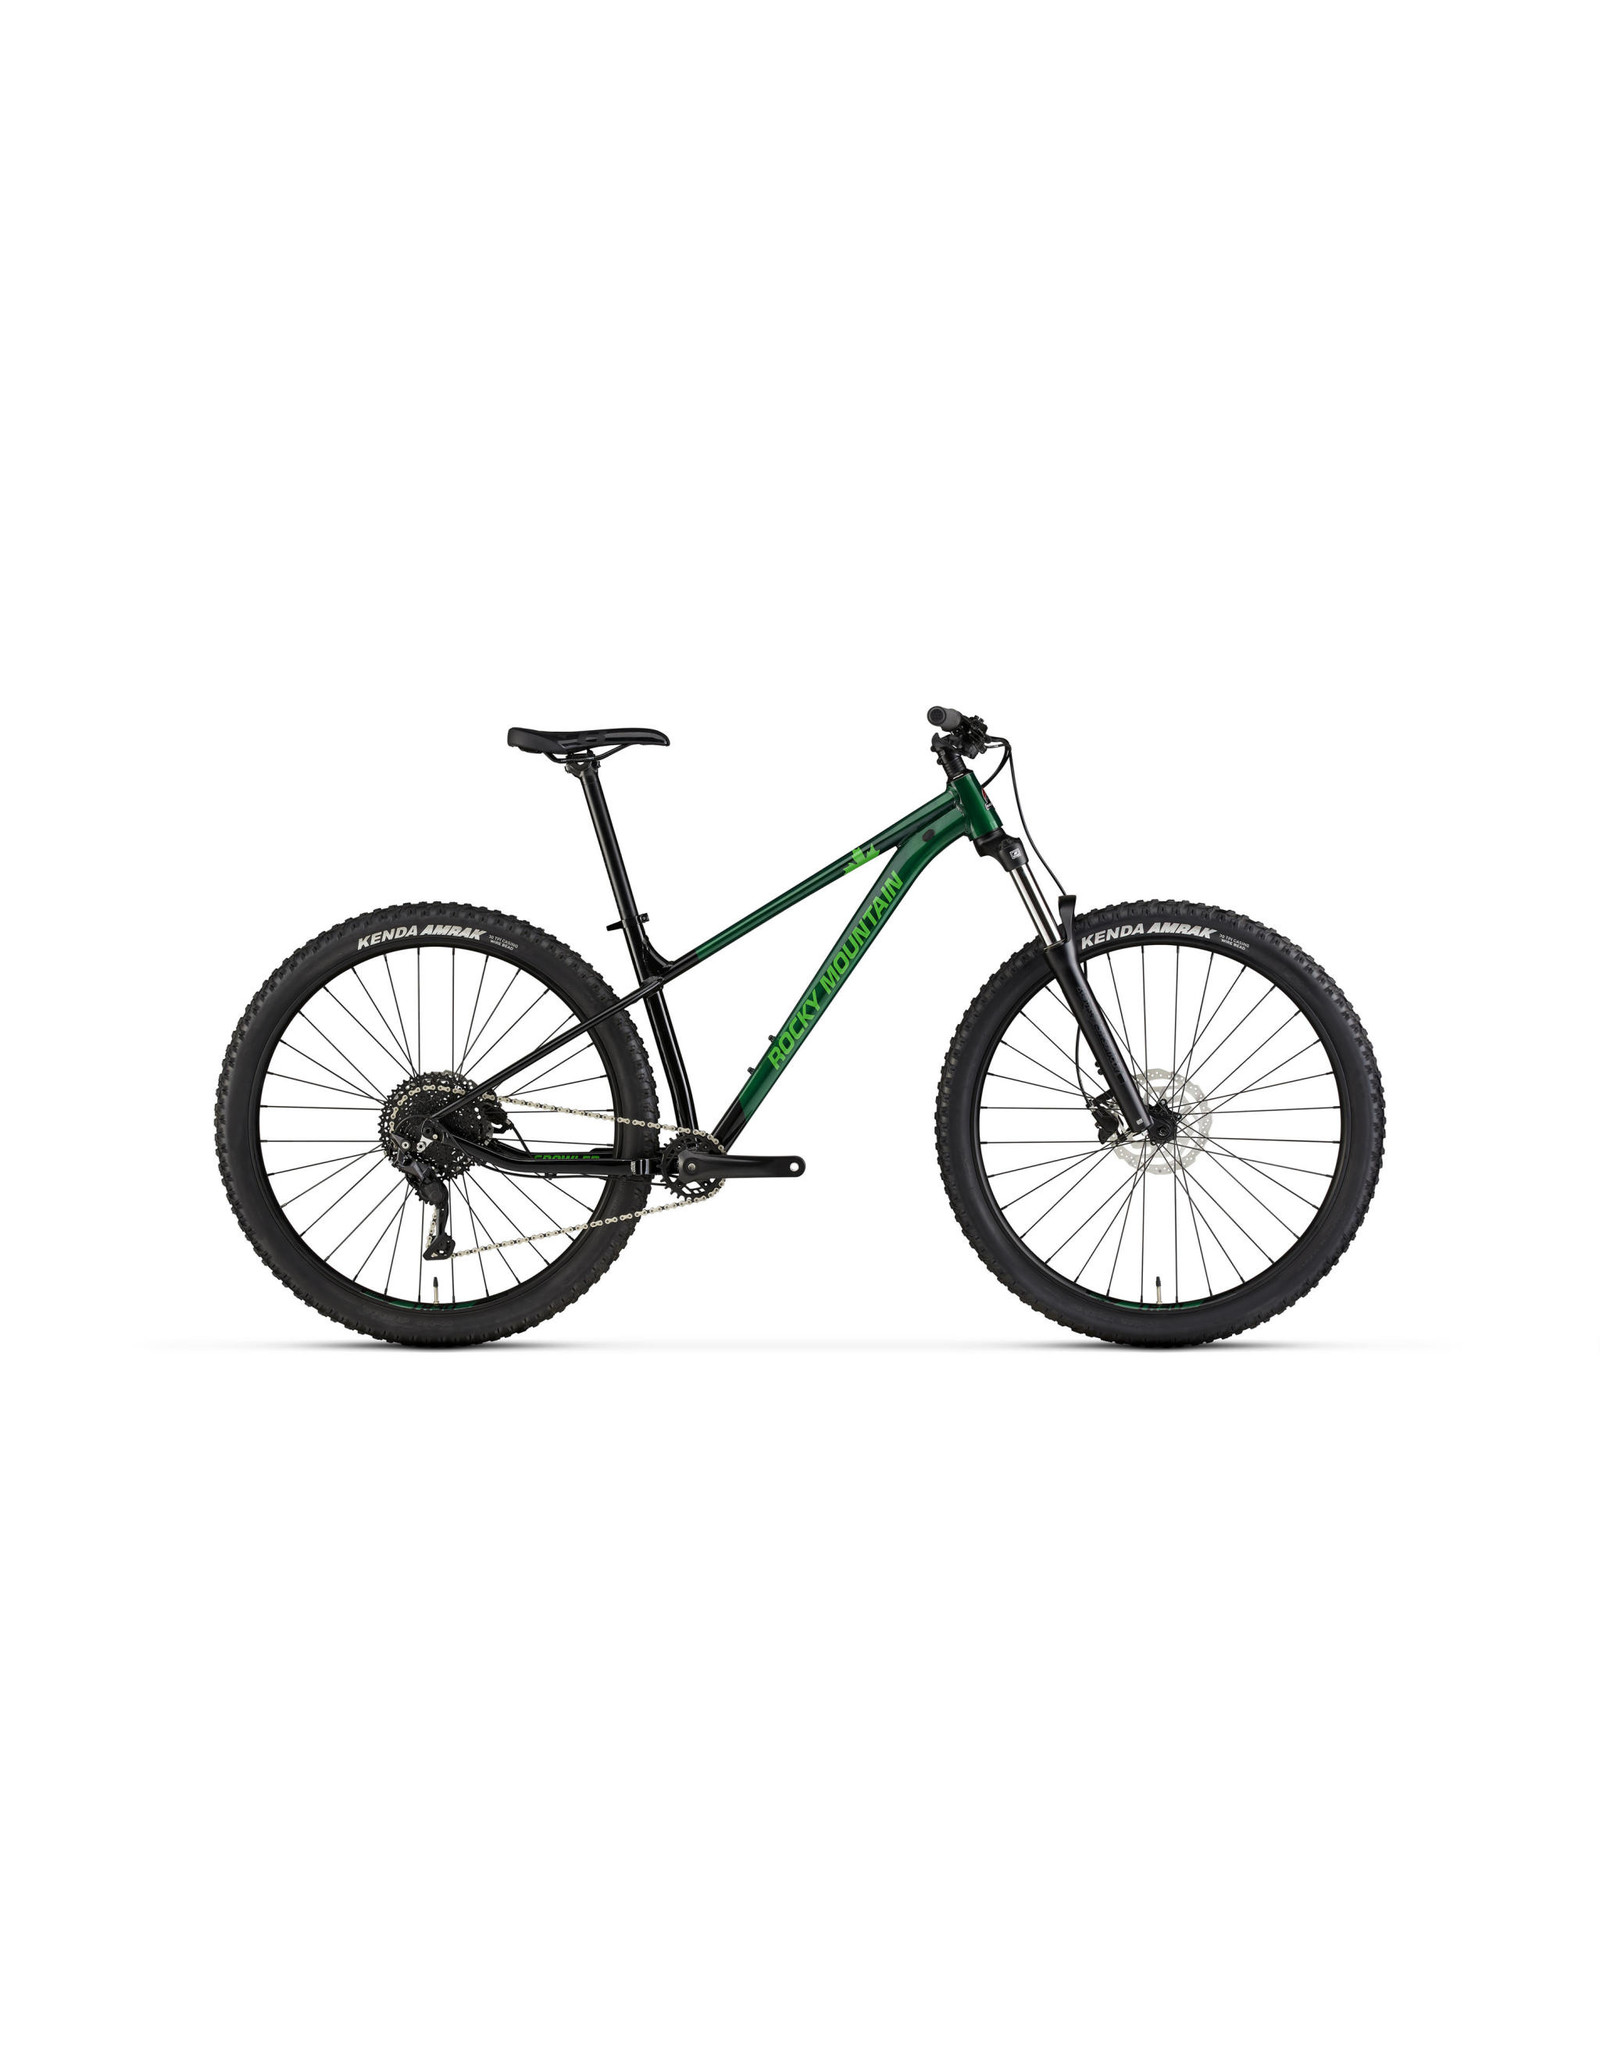 ROCKY MOUNTAIN 2021 Rocky Mountain Growler 20  - Black/Green - Large